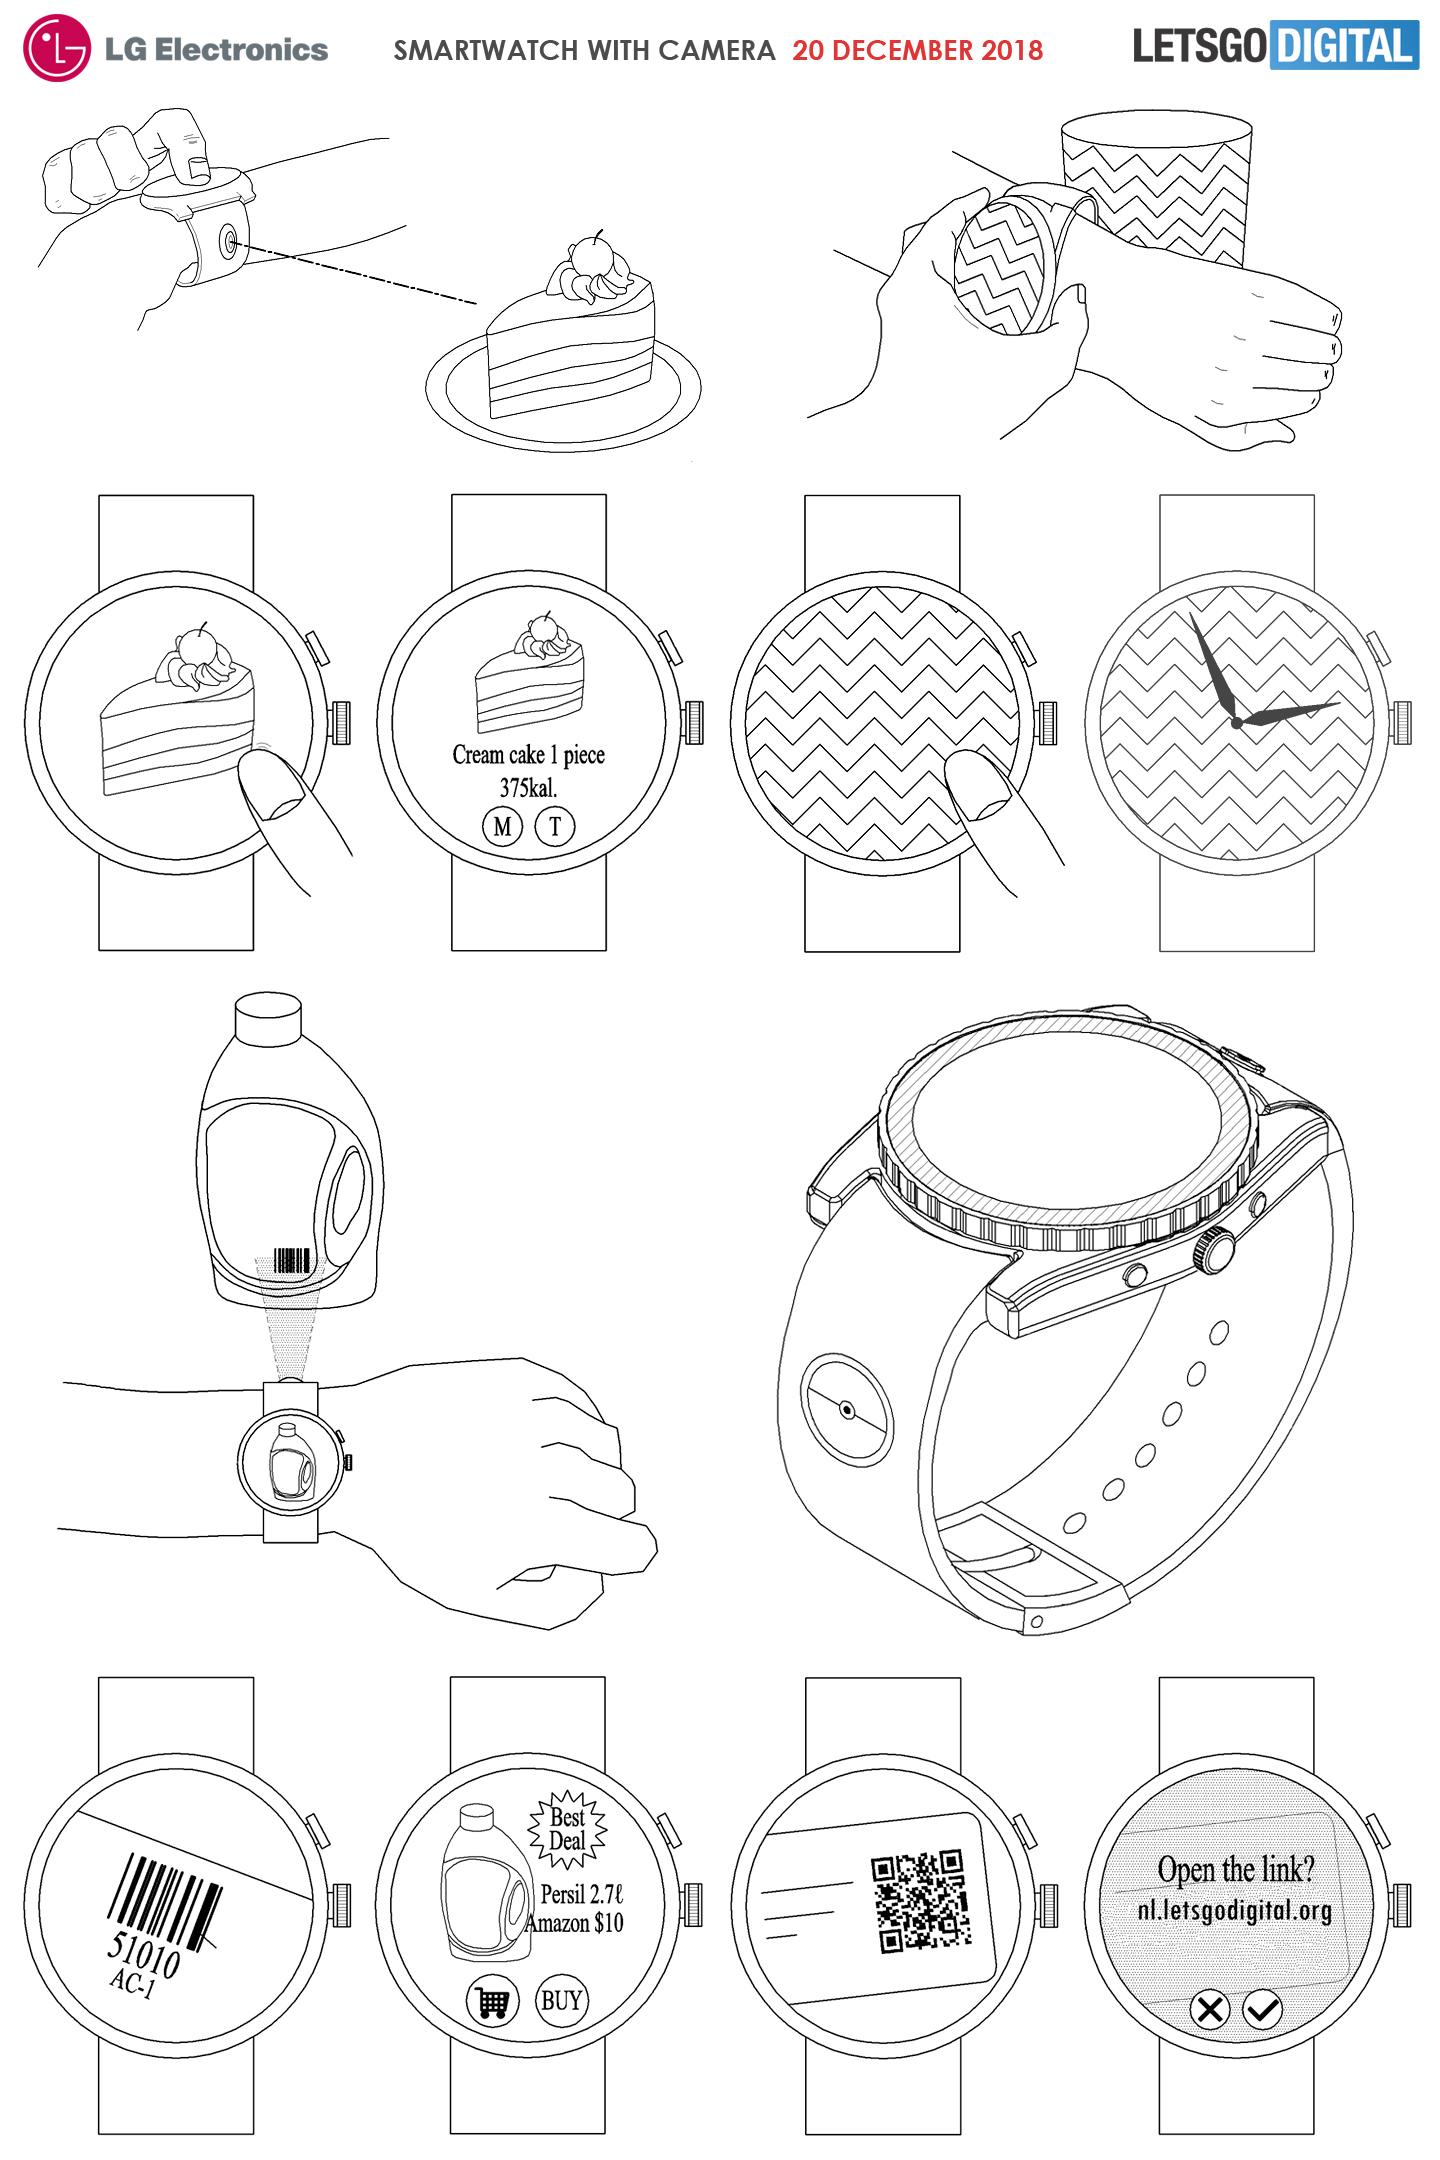 Smartwatch camera